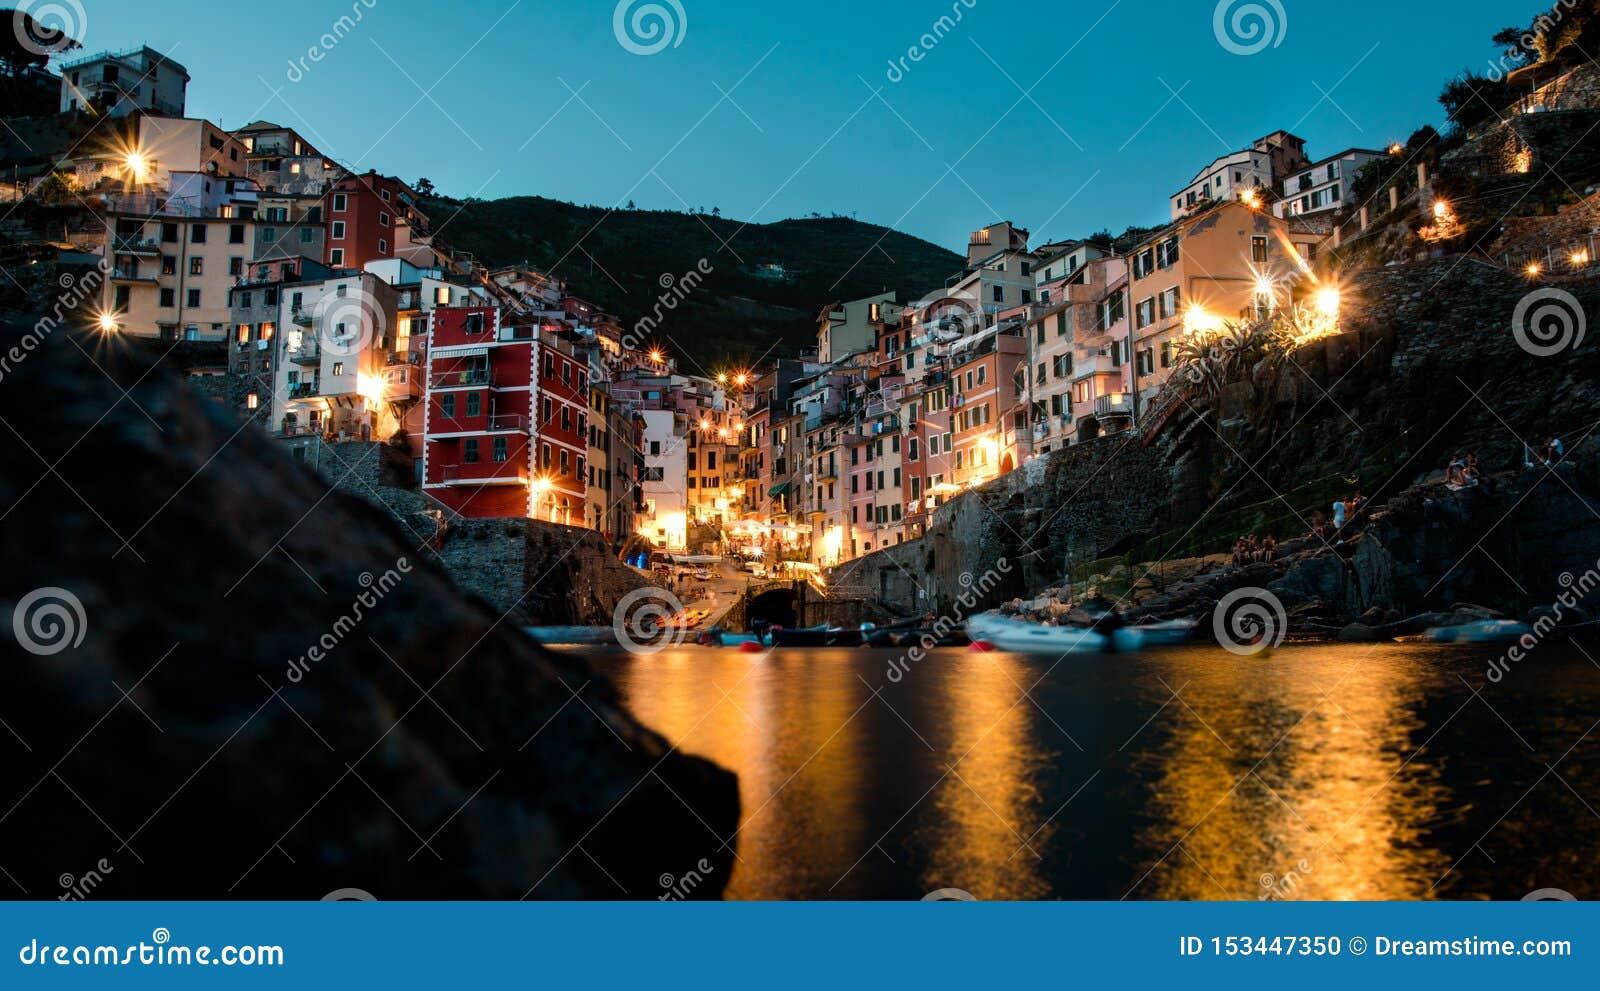 Riomaggiore cinque terre niskiego kąta ujawnienia długa noc